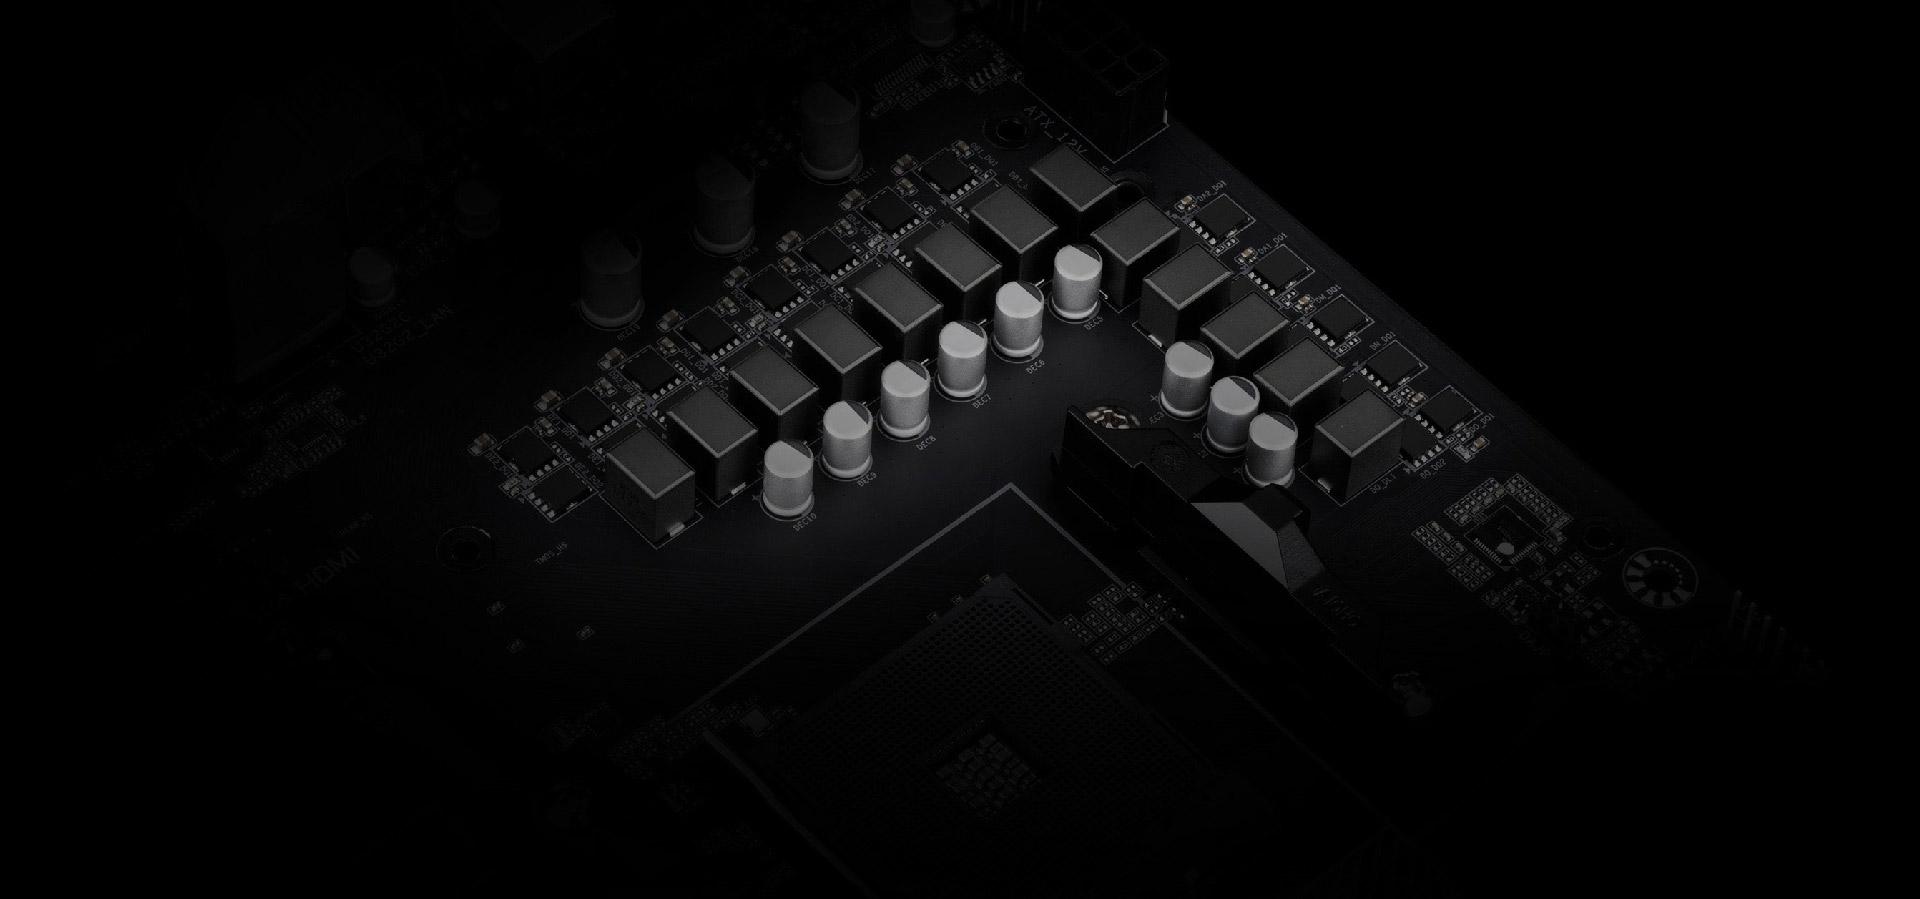 Hybrid-Digital of the motherboard